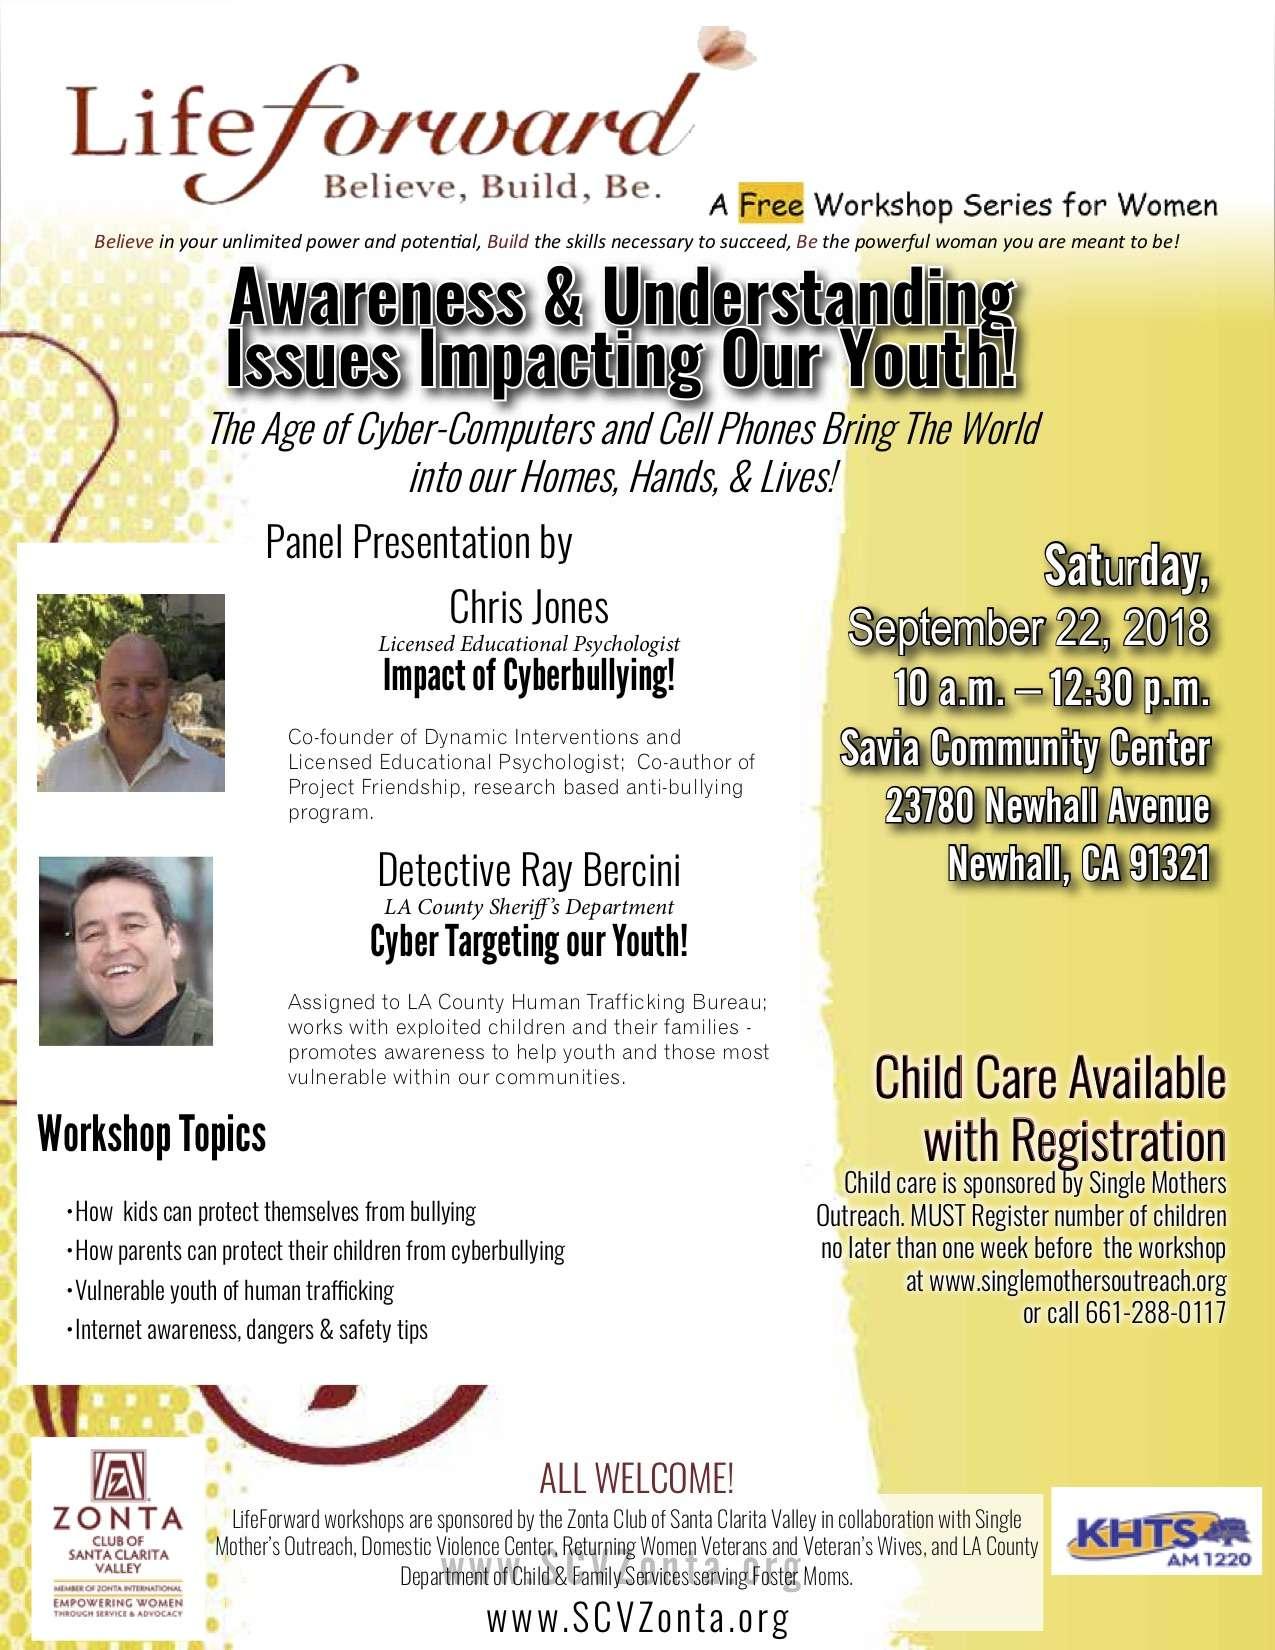 SEP 2018 Awareness & Understand Issues (rev 9-2-18)